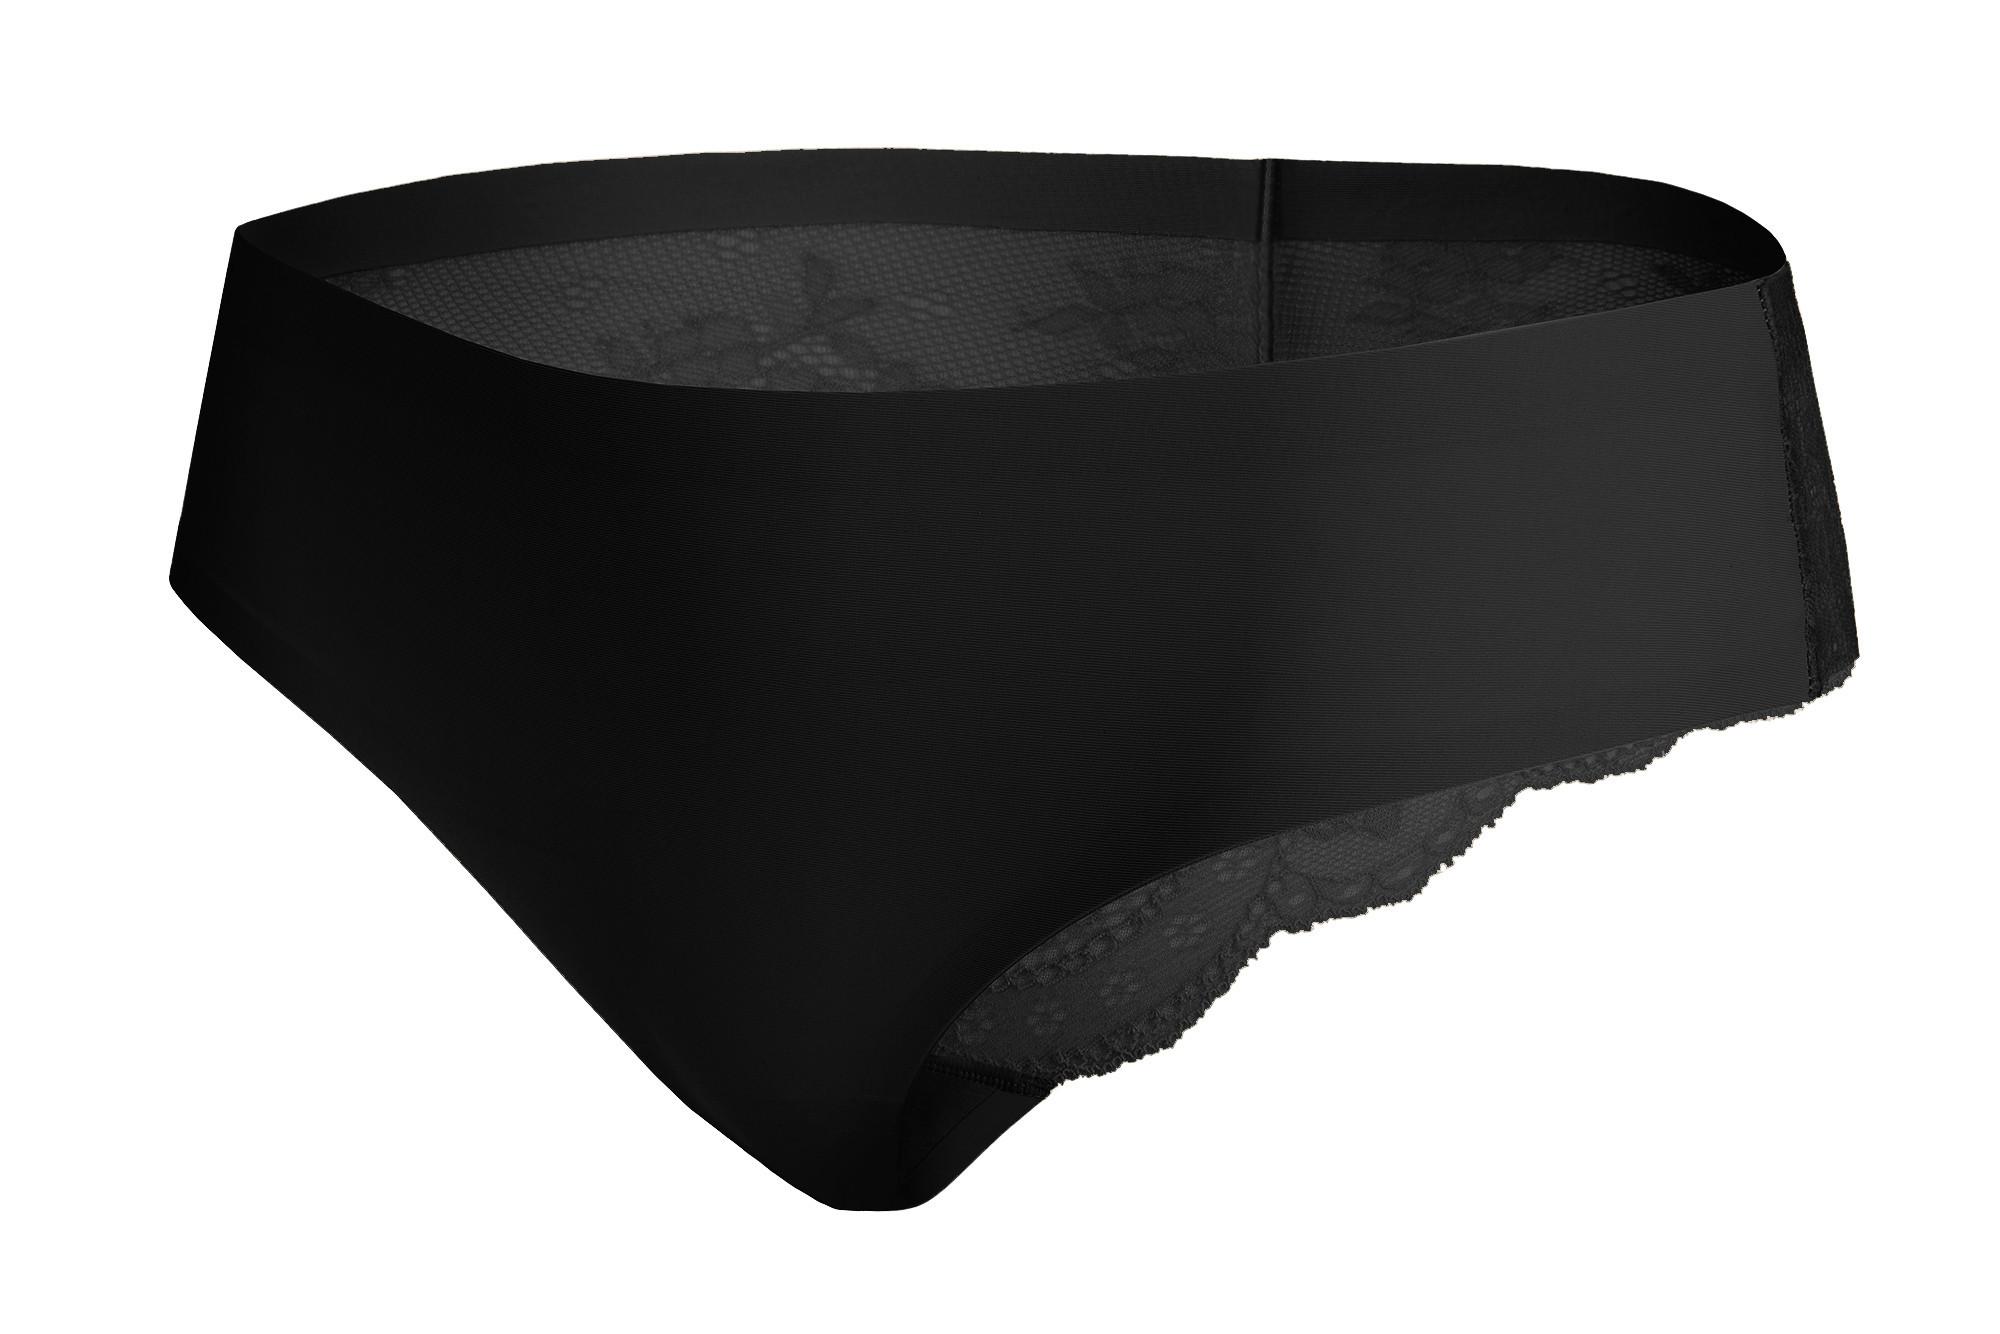 Nohavičky Tanga čierna - Julimex Čierna M